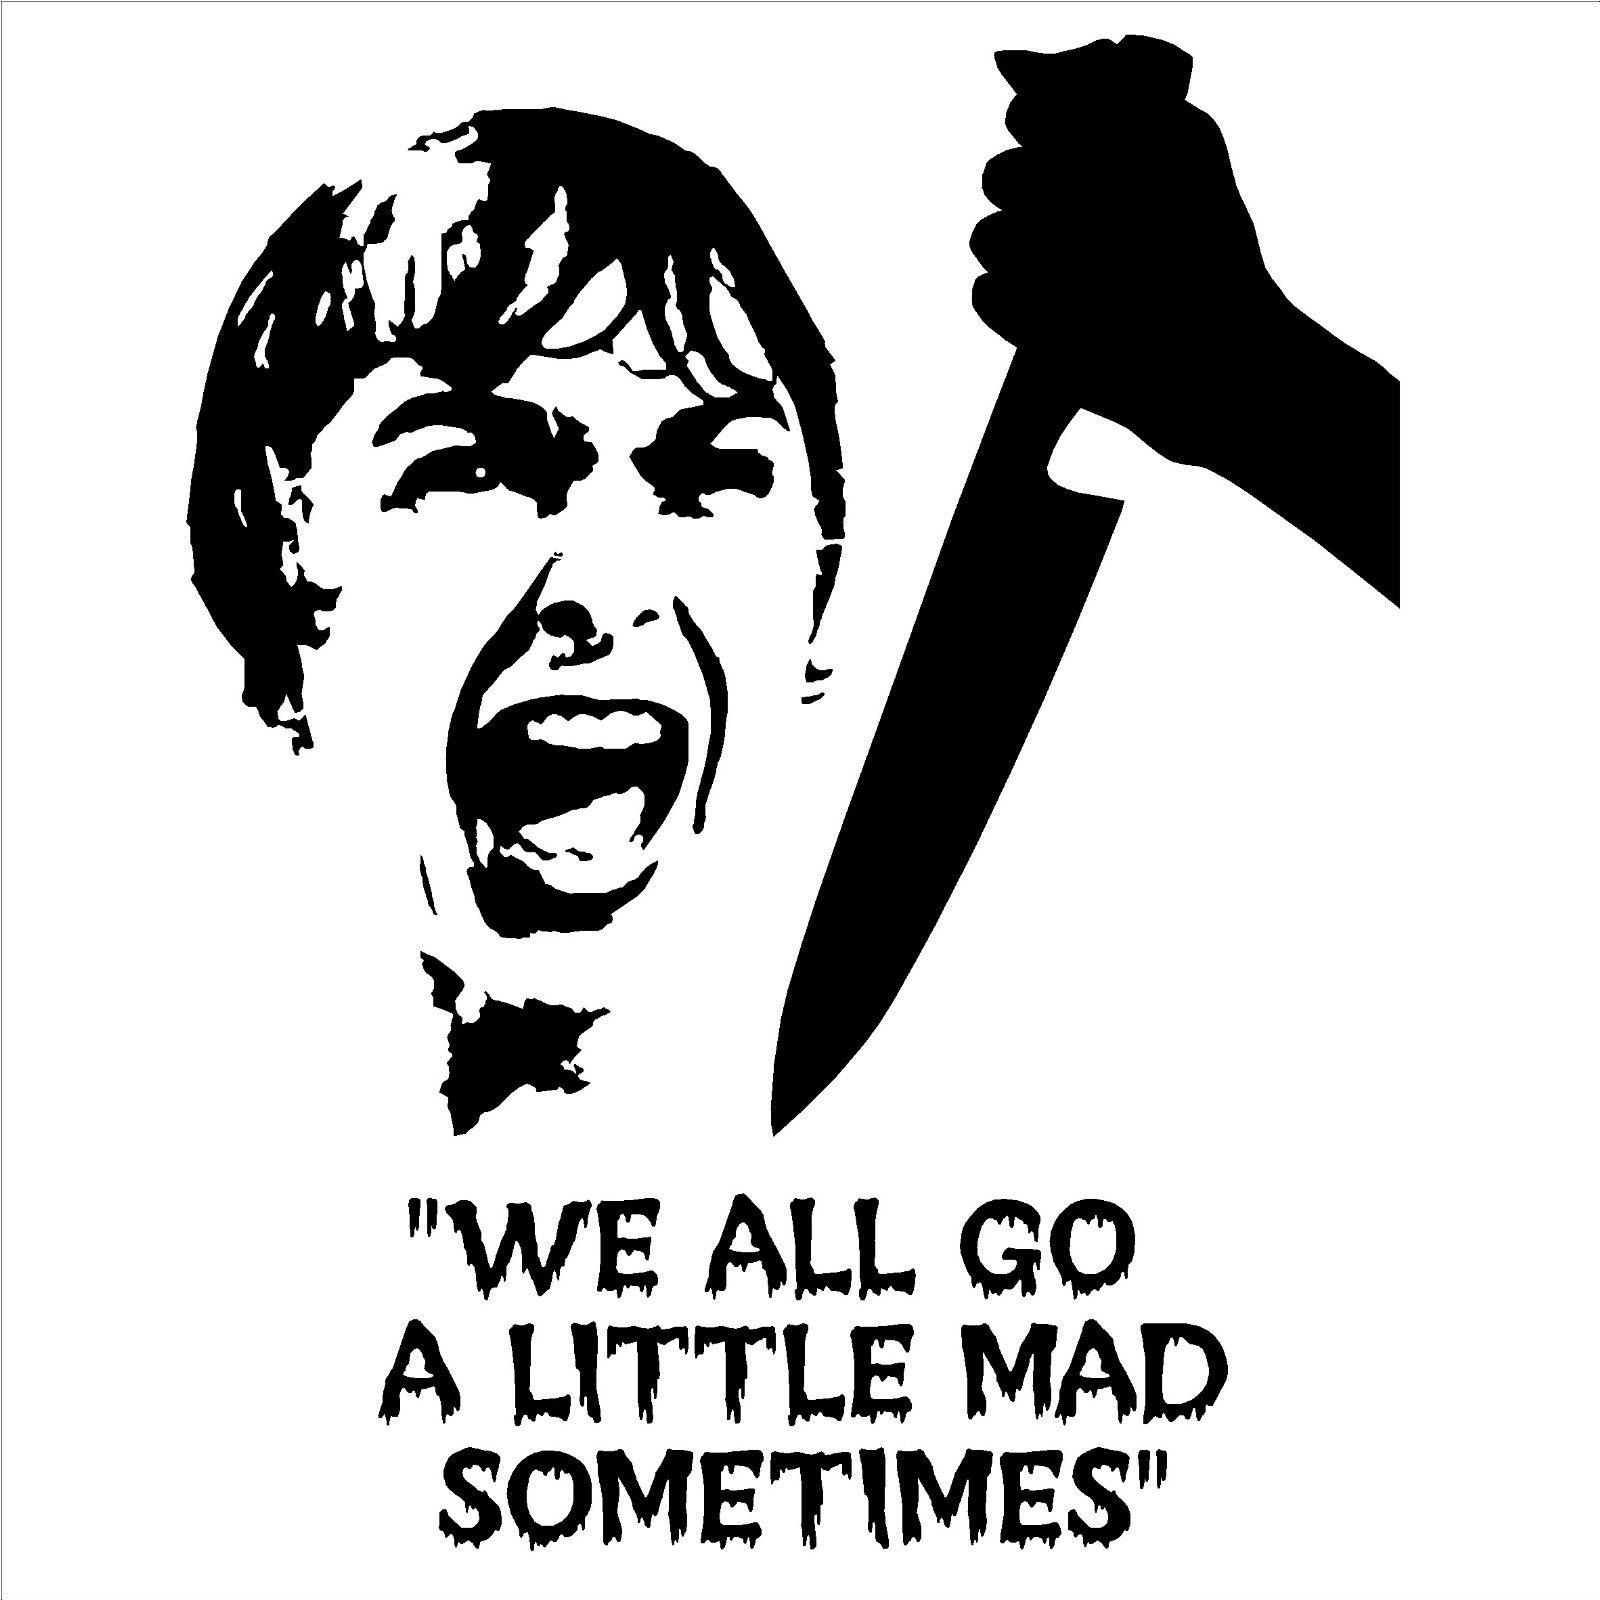 ALFRED HITCHCOCK PSYCHO 우리 모두는 때때로 약간 화가납니다. VINYL WALL ART STICKER